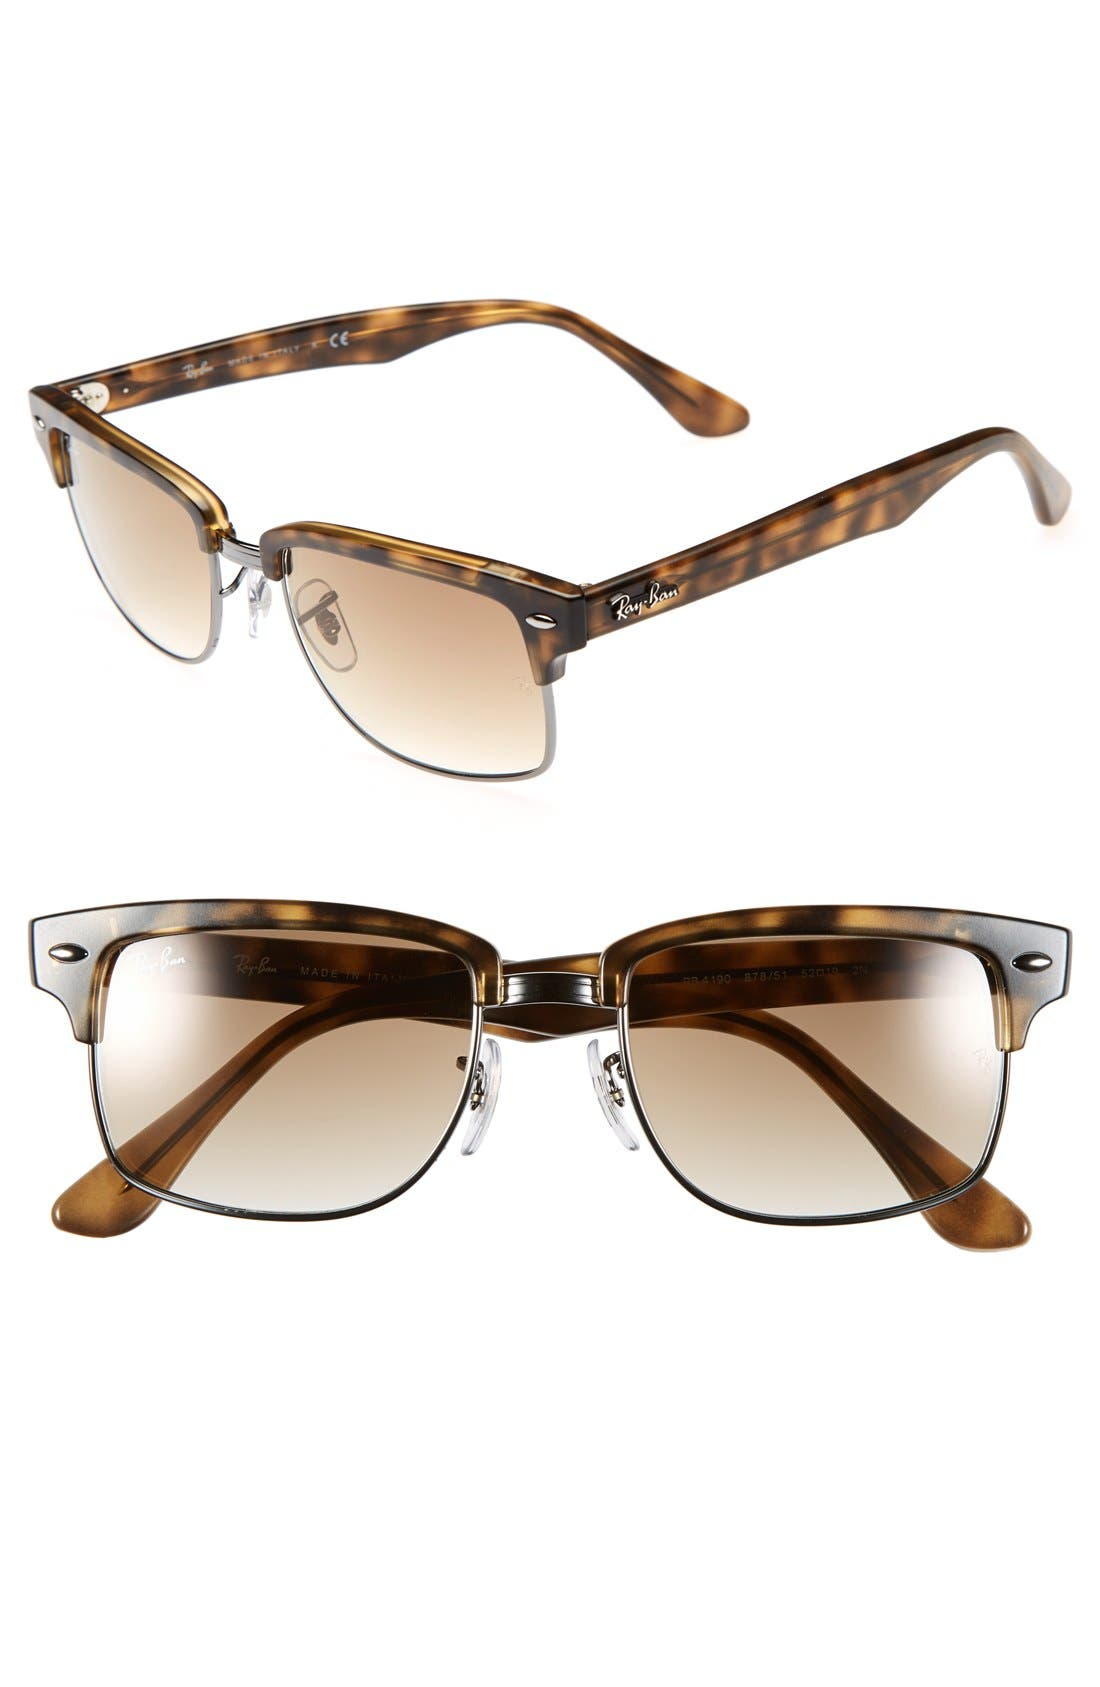 Main Image - Ray-Ban 'Clubmaster' Square 52mm Sunglasses